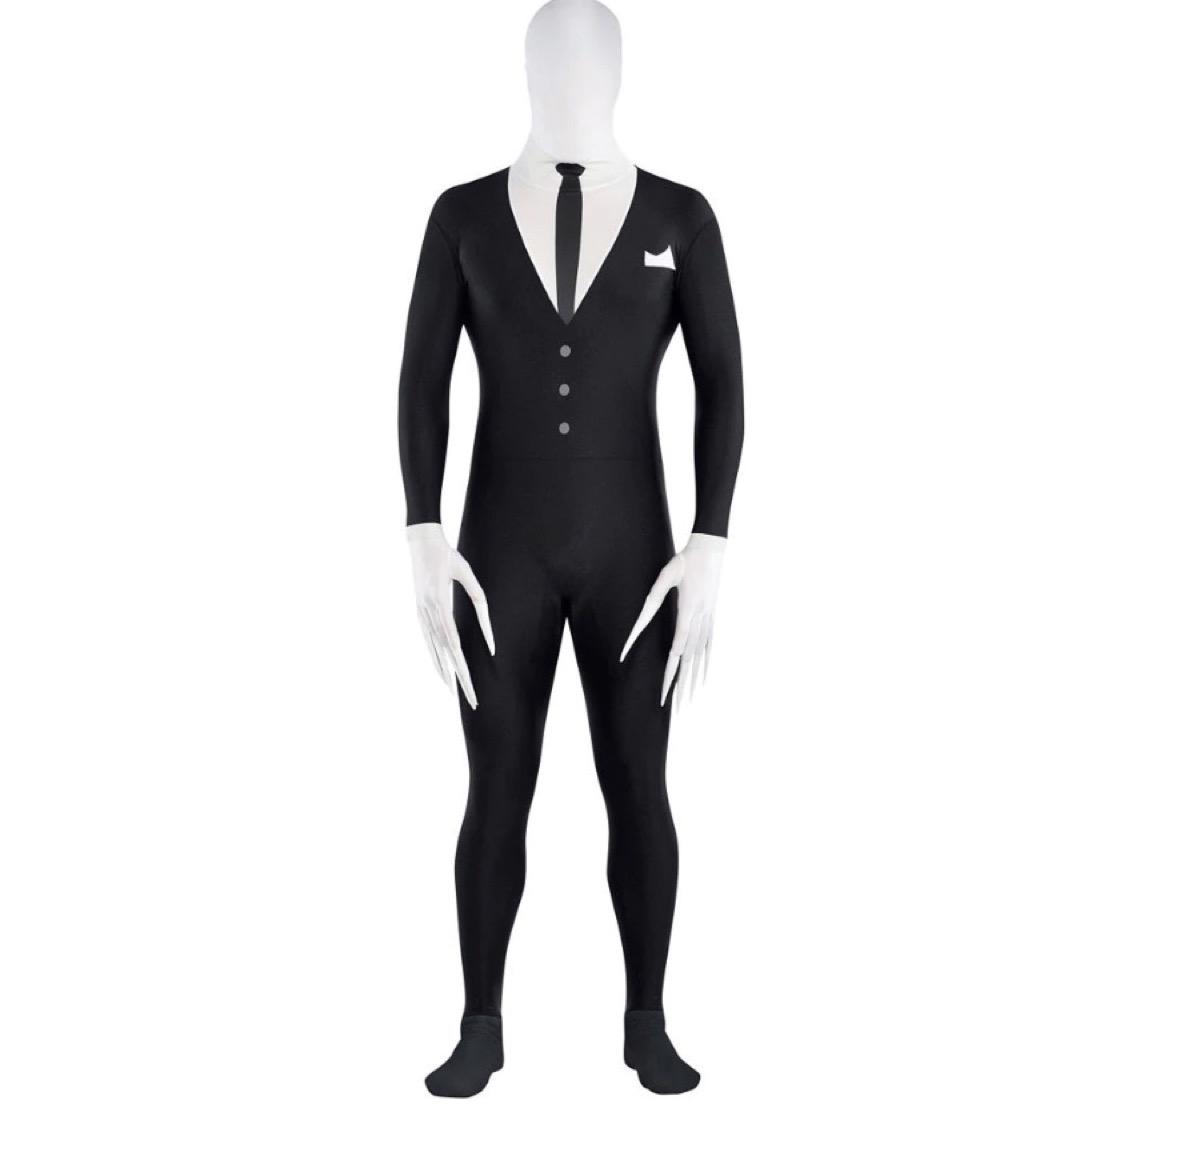 slender man costume, best halloween costumes